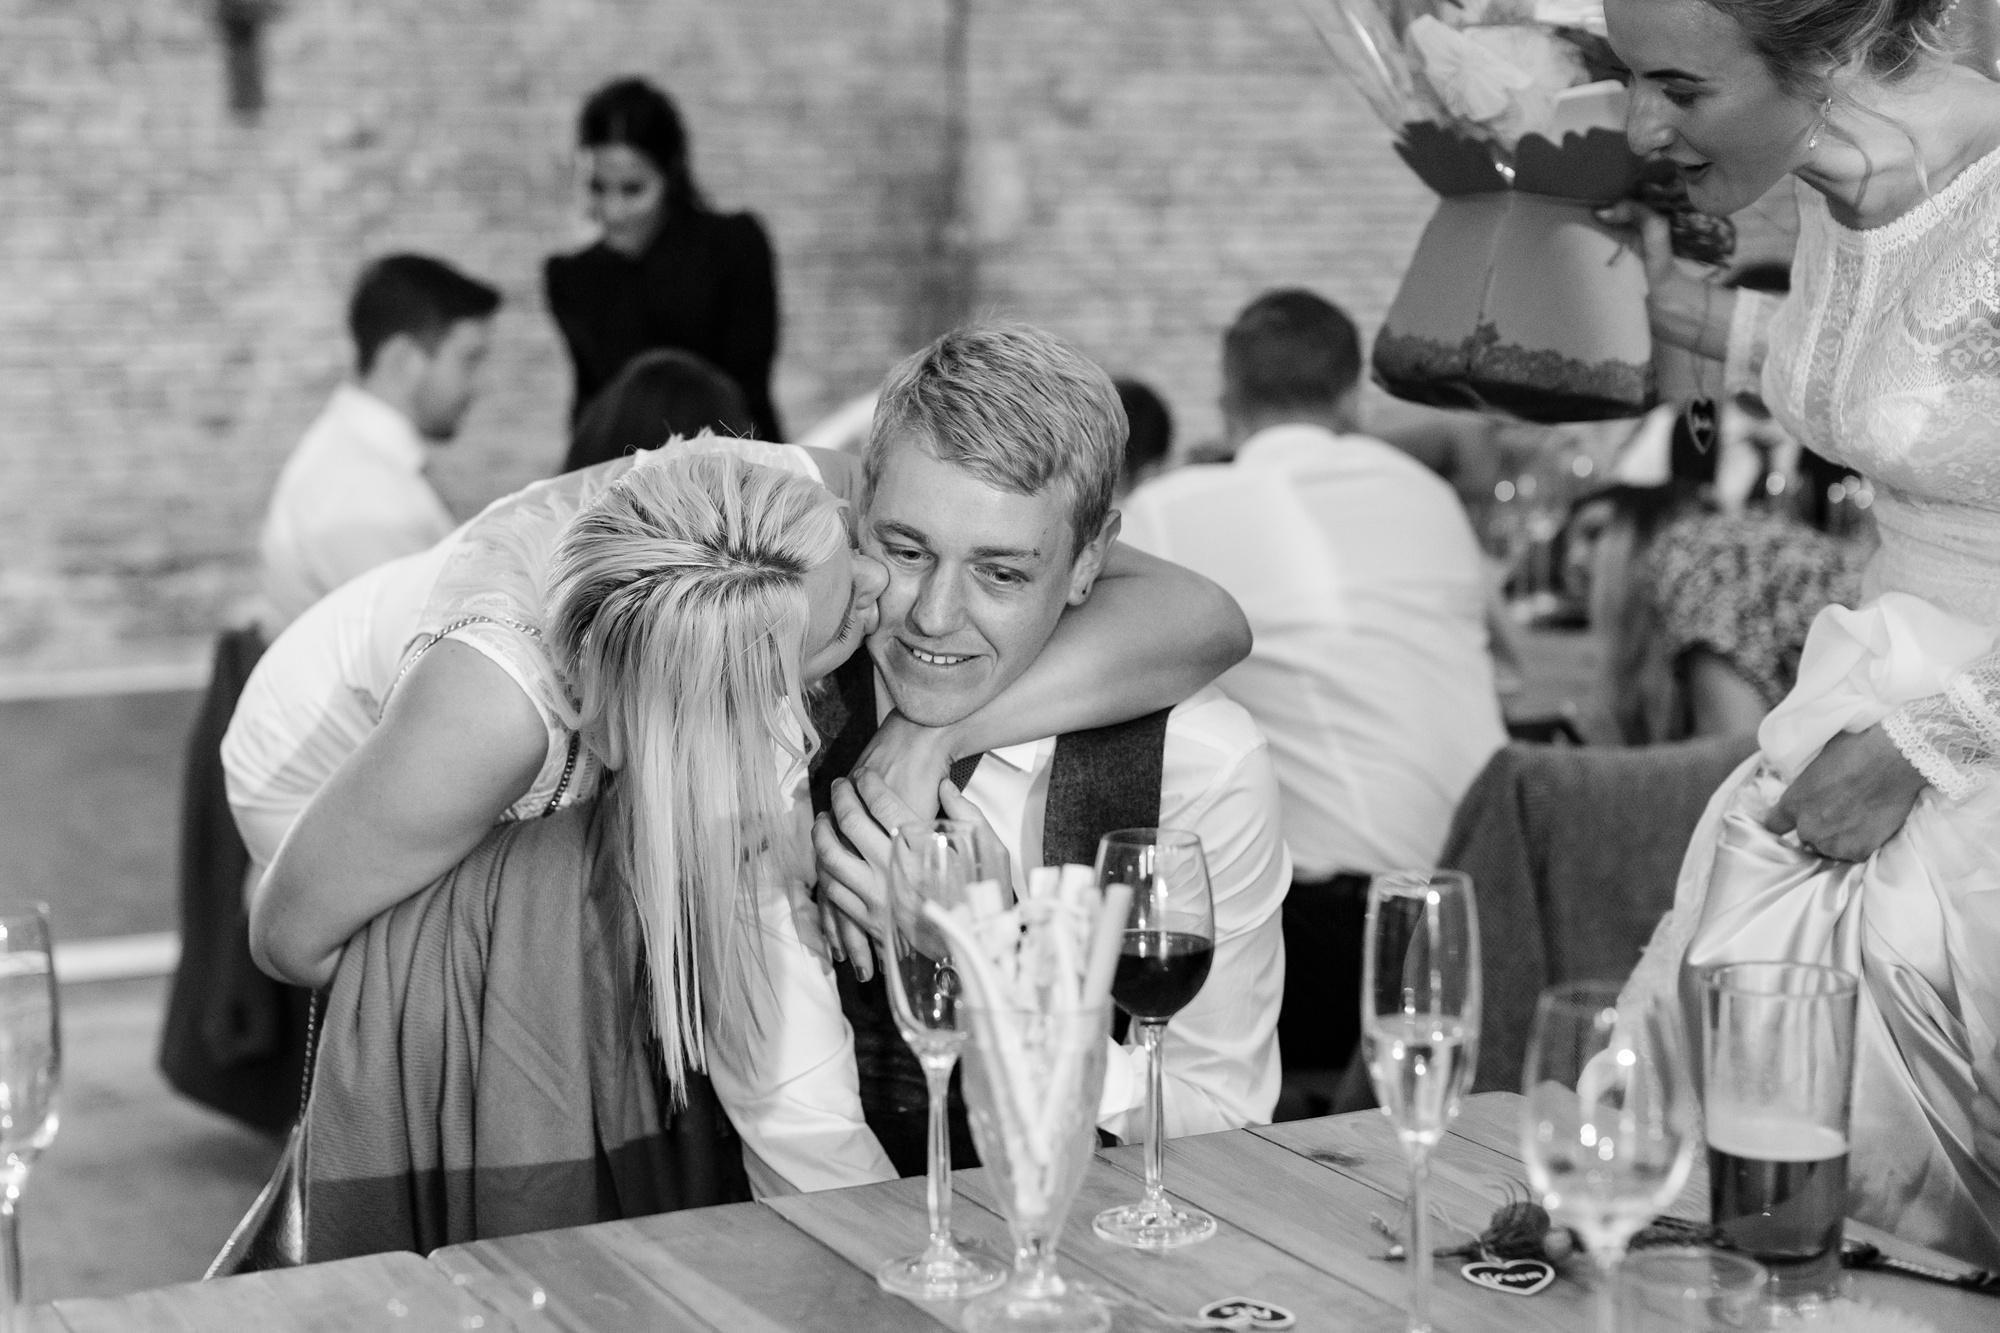 Girlfriend kisses best man on the cheek